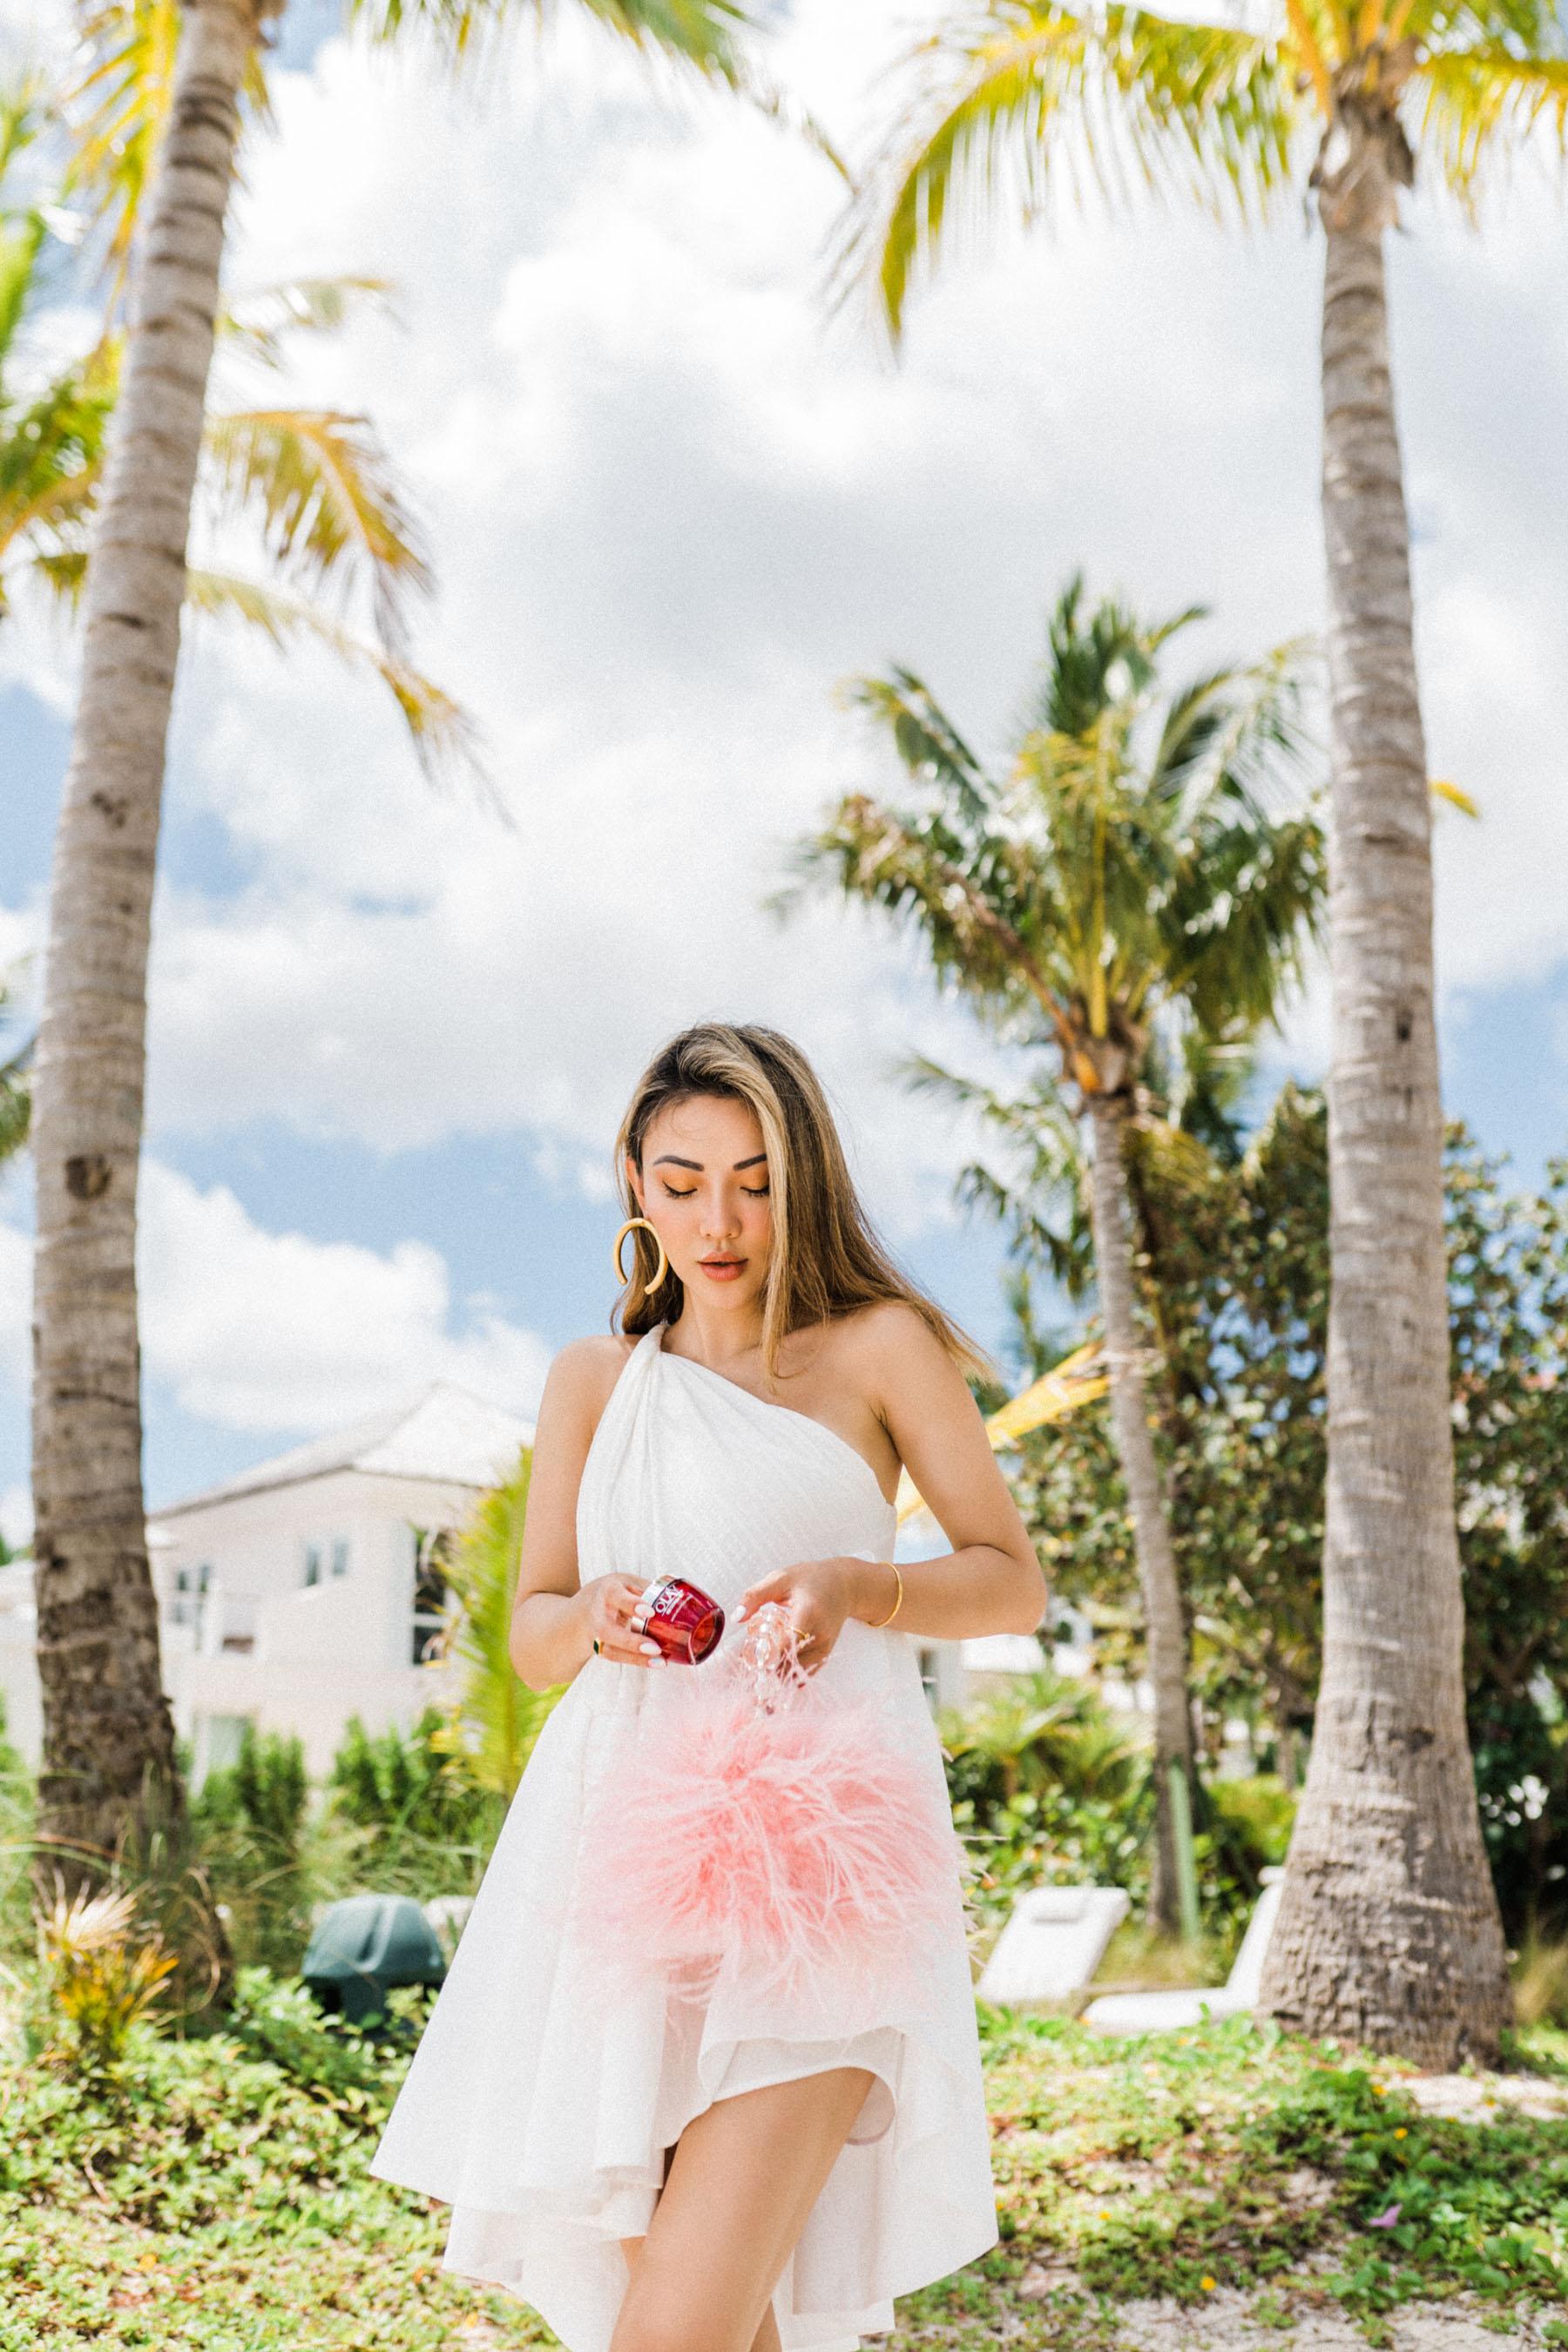 white one shoulder dress, pink fluffy handbag, hoop earrings, essential moisturizer for fresh summer skin, Olay regenerist // Notjessfashion.com